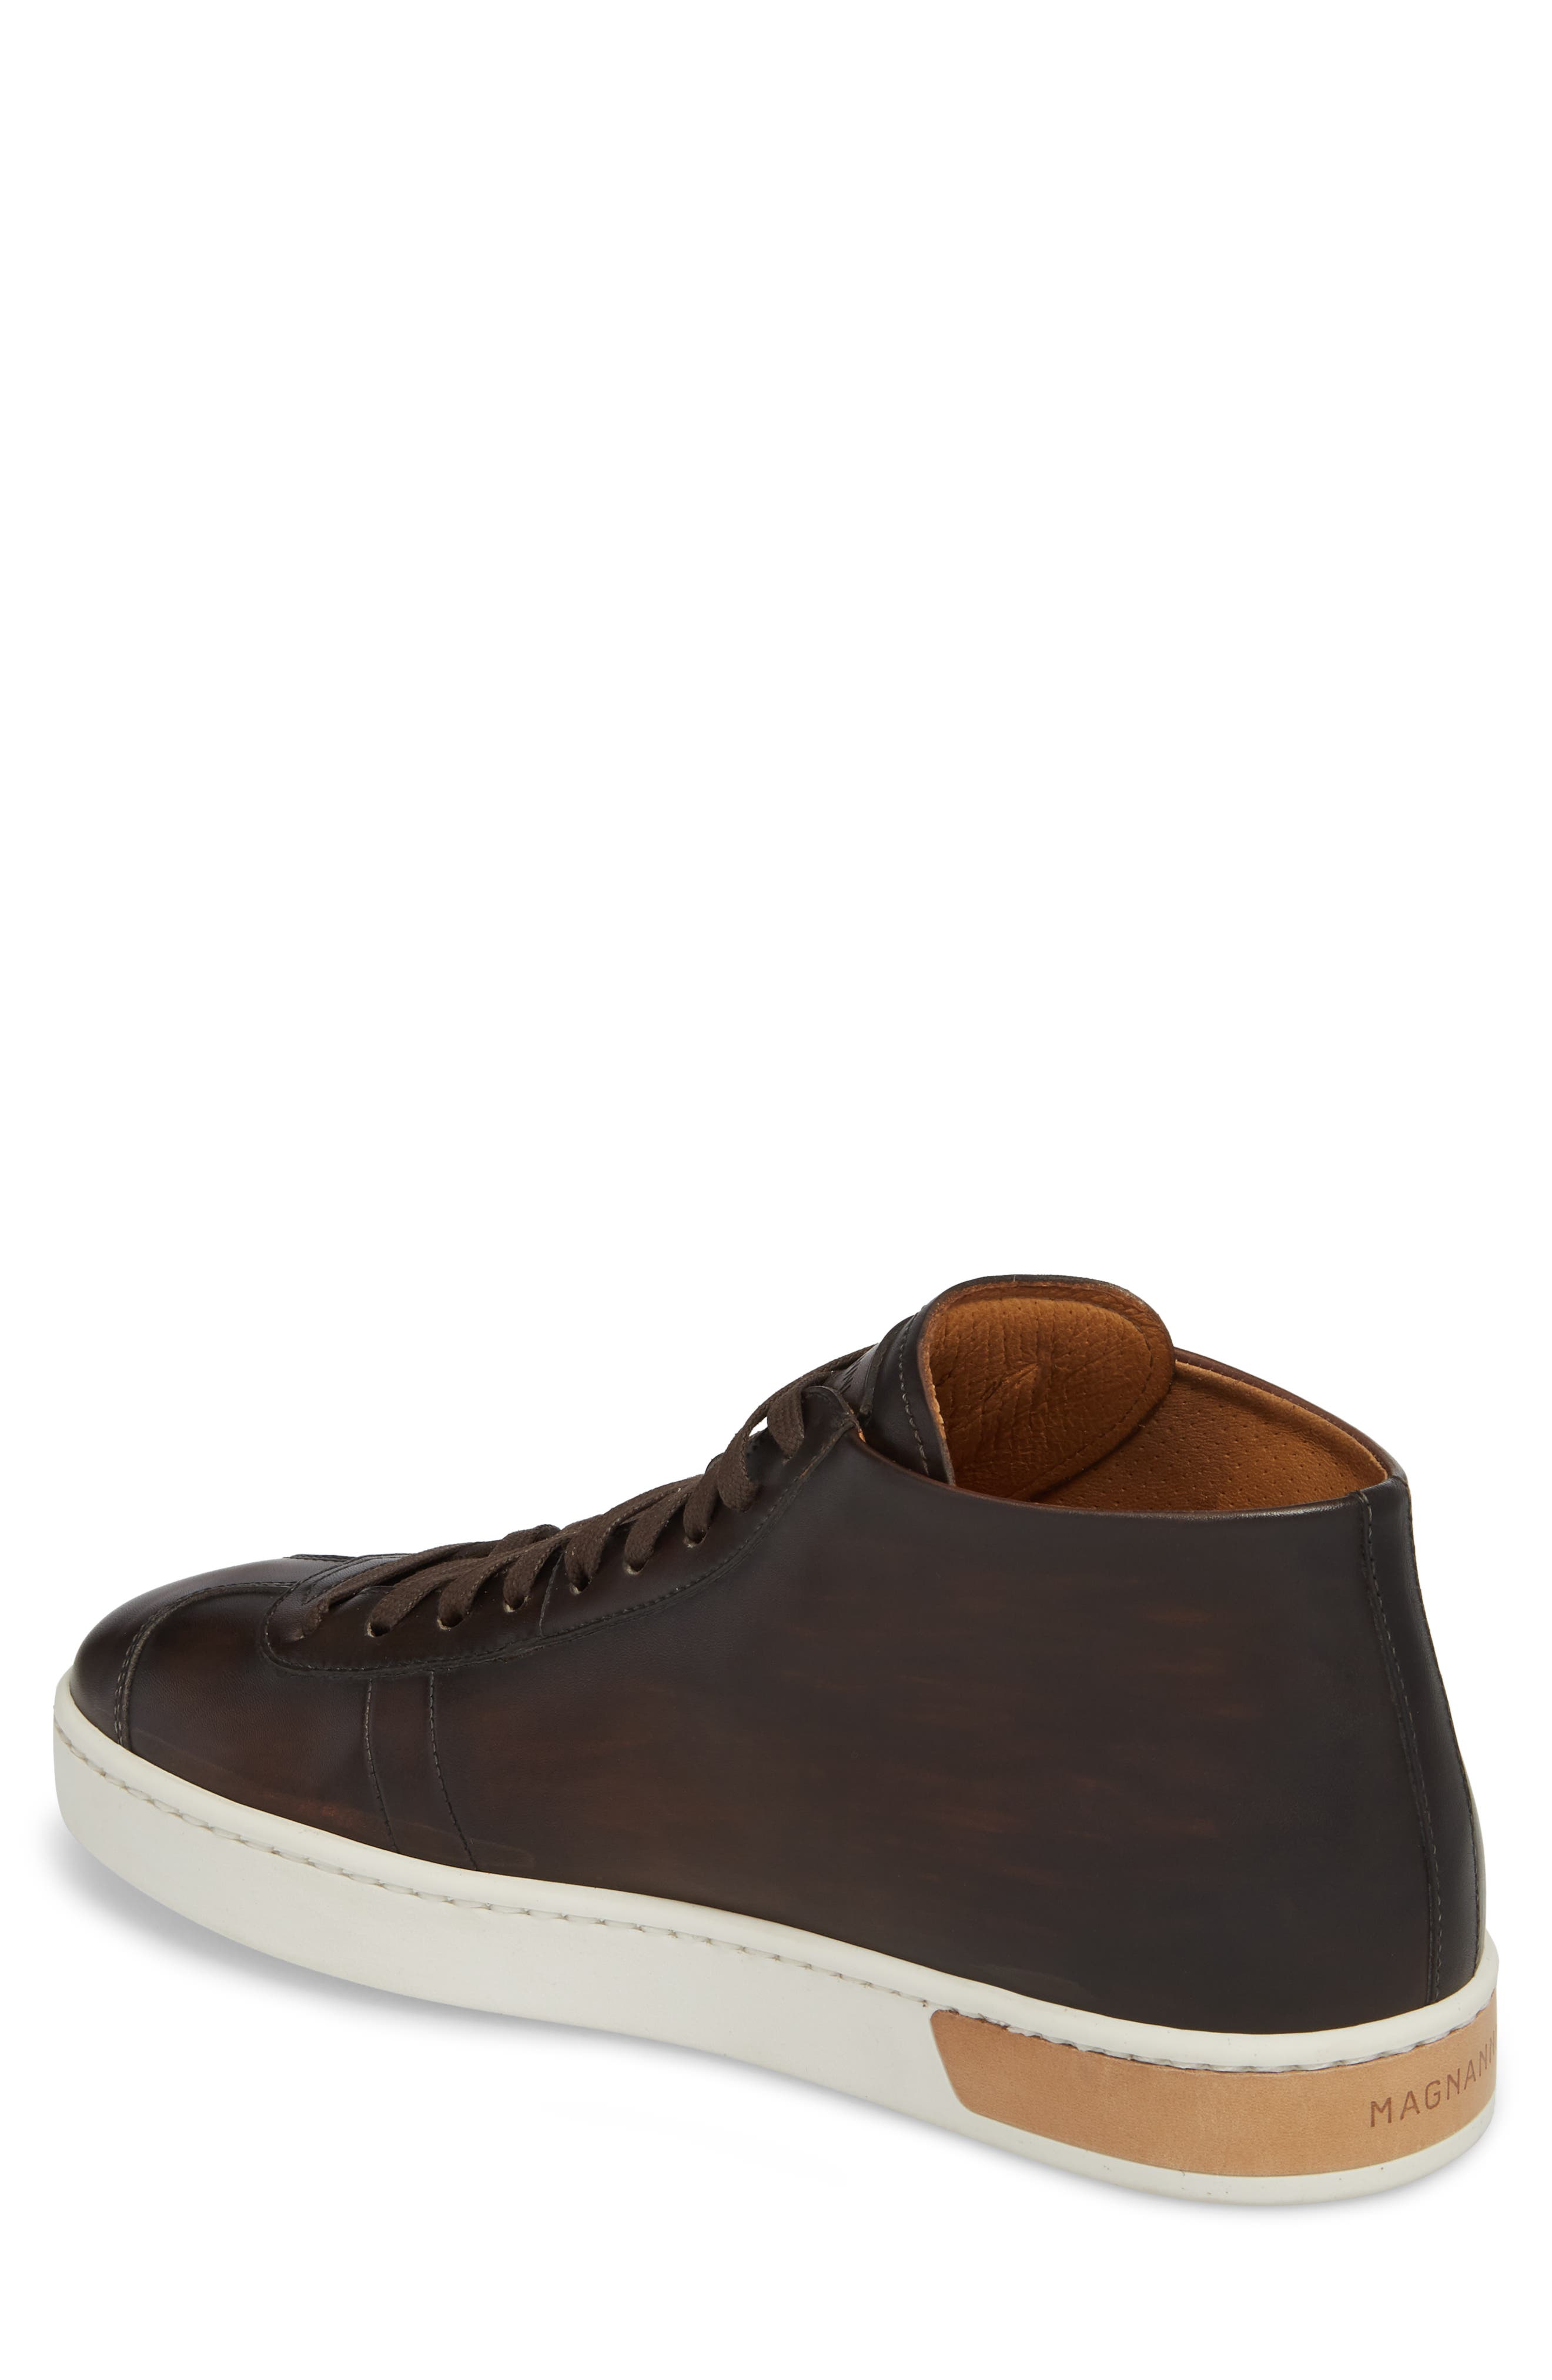 Gunner Mid Top Sneaker,                             Alternate thumbnail 2, color,                             Brown Leather